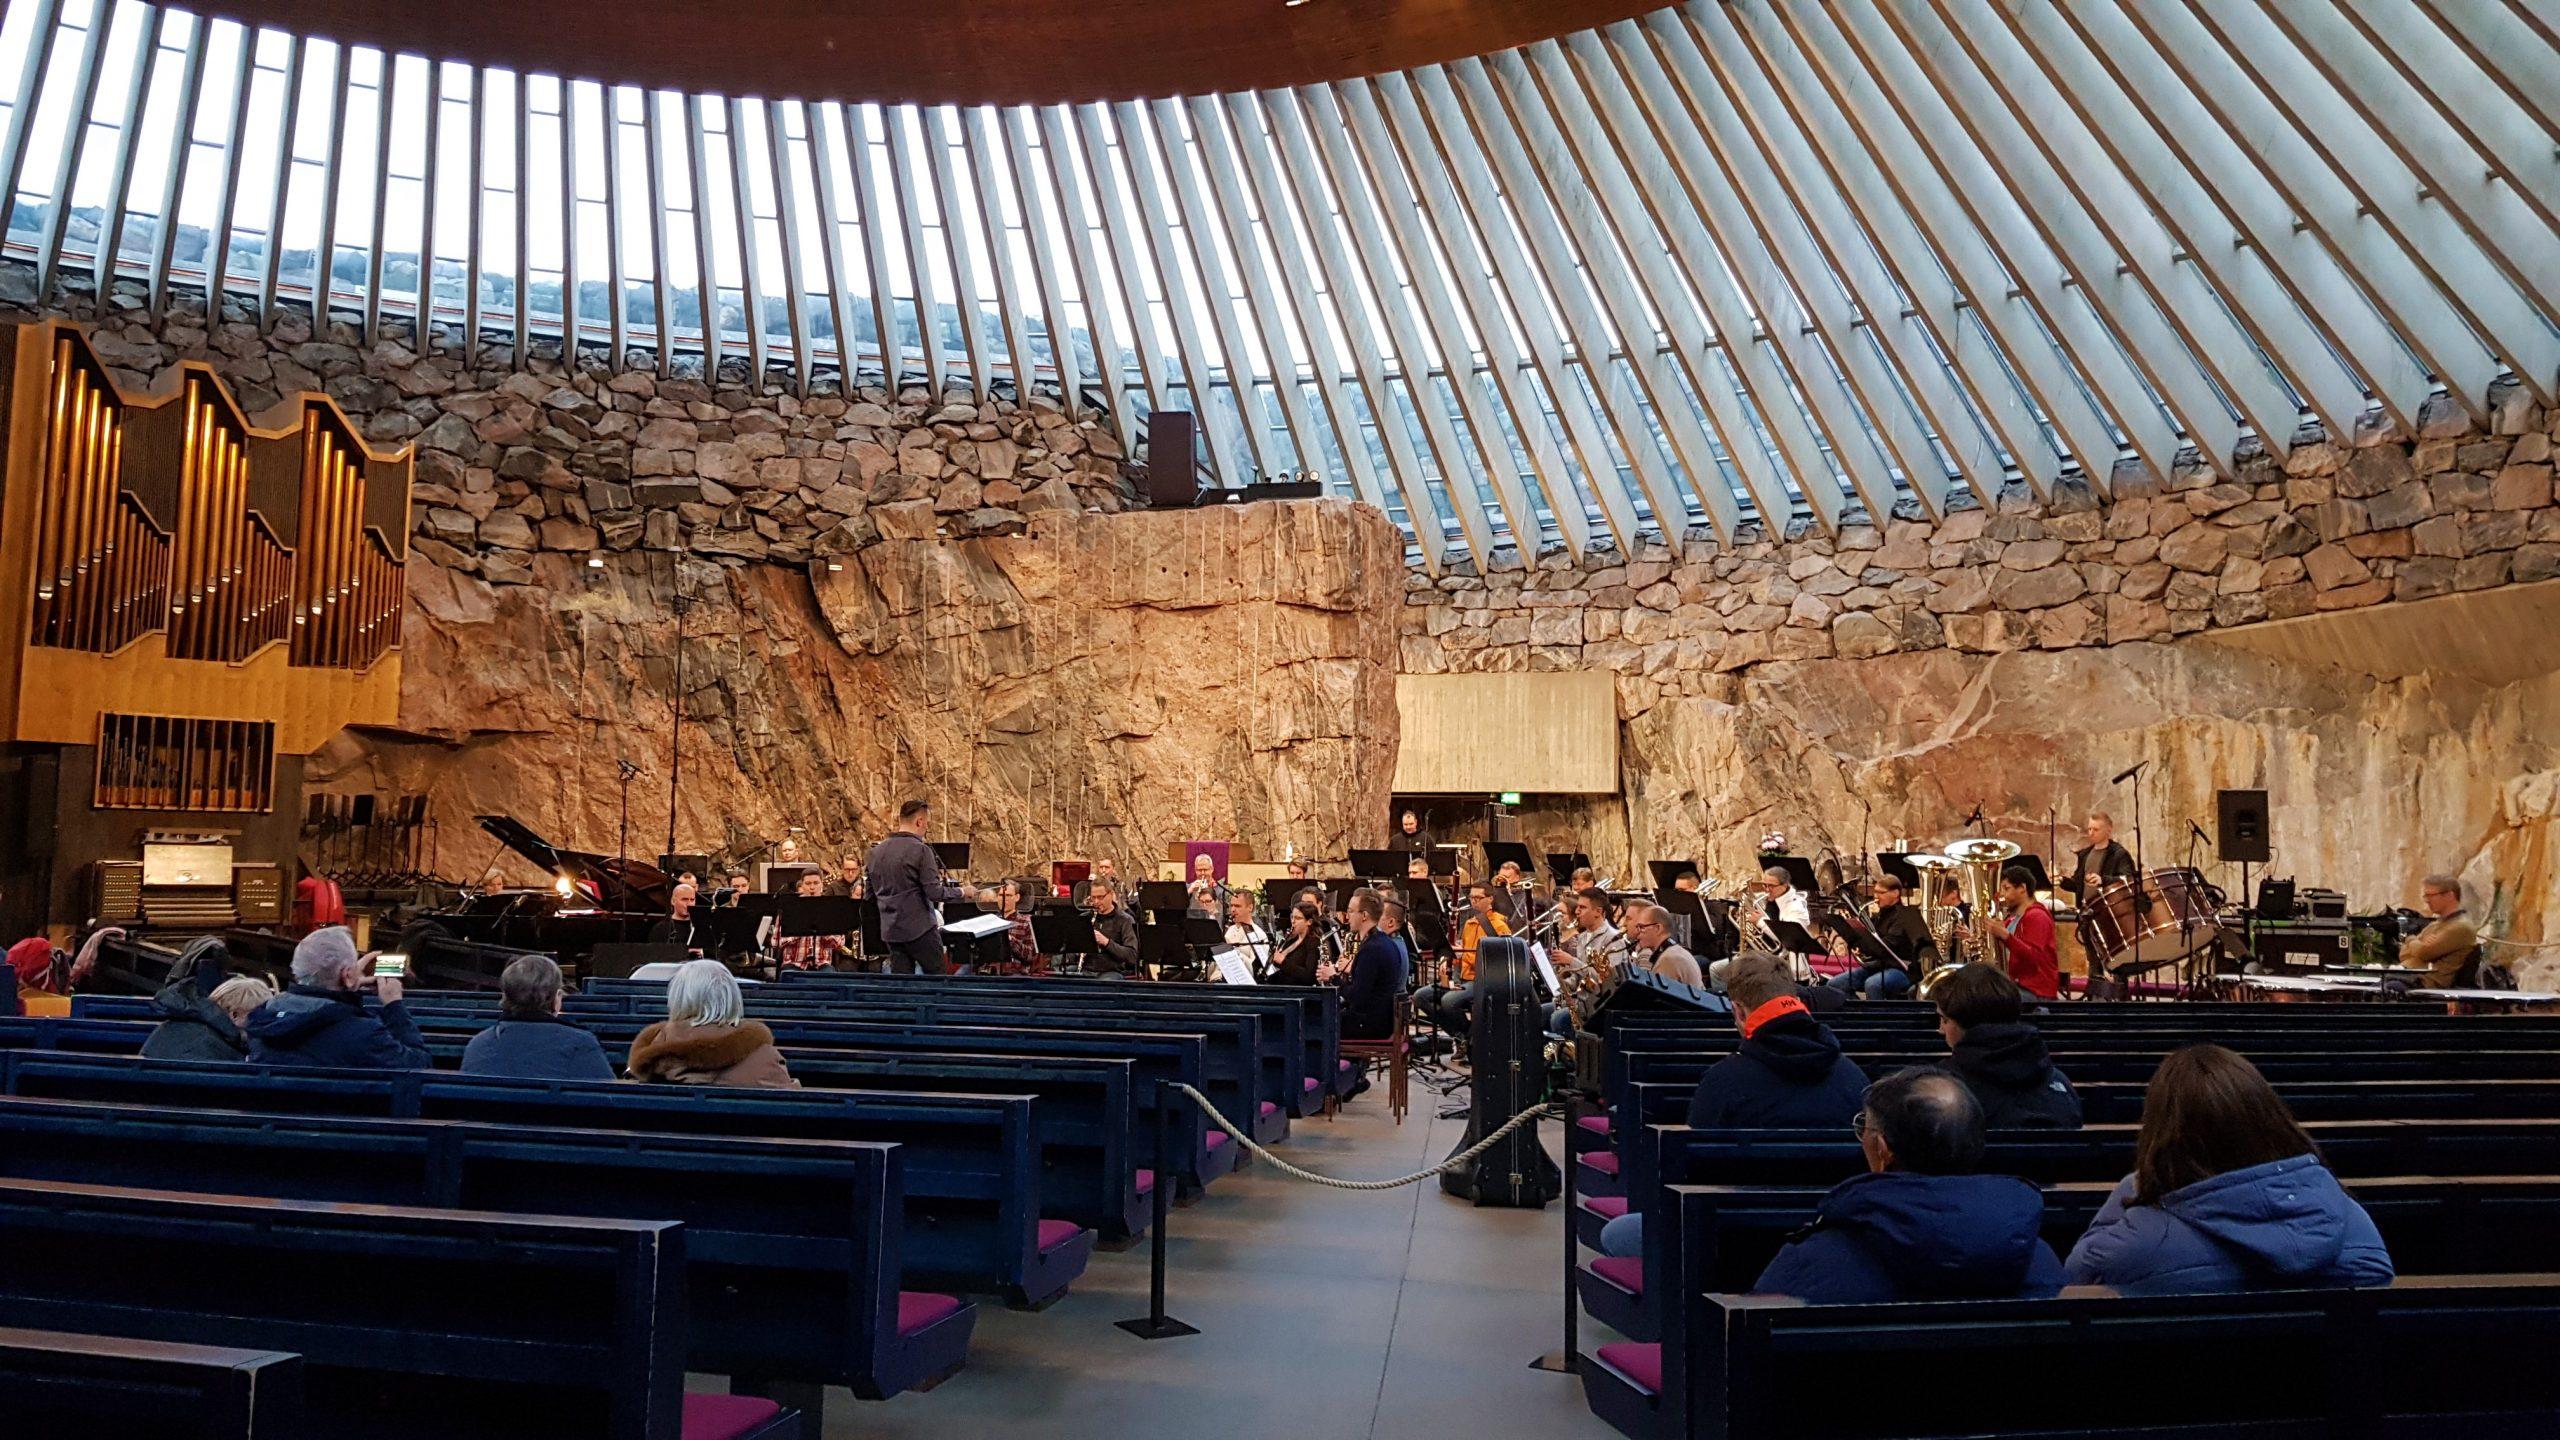 Orquesta dentro de la iglesia de piedra.